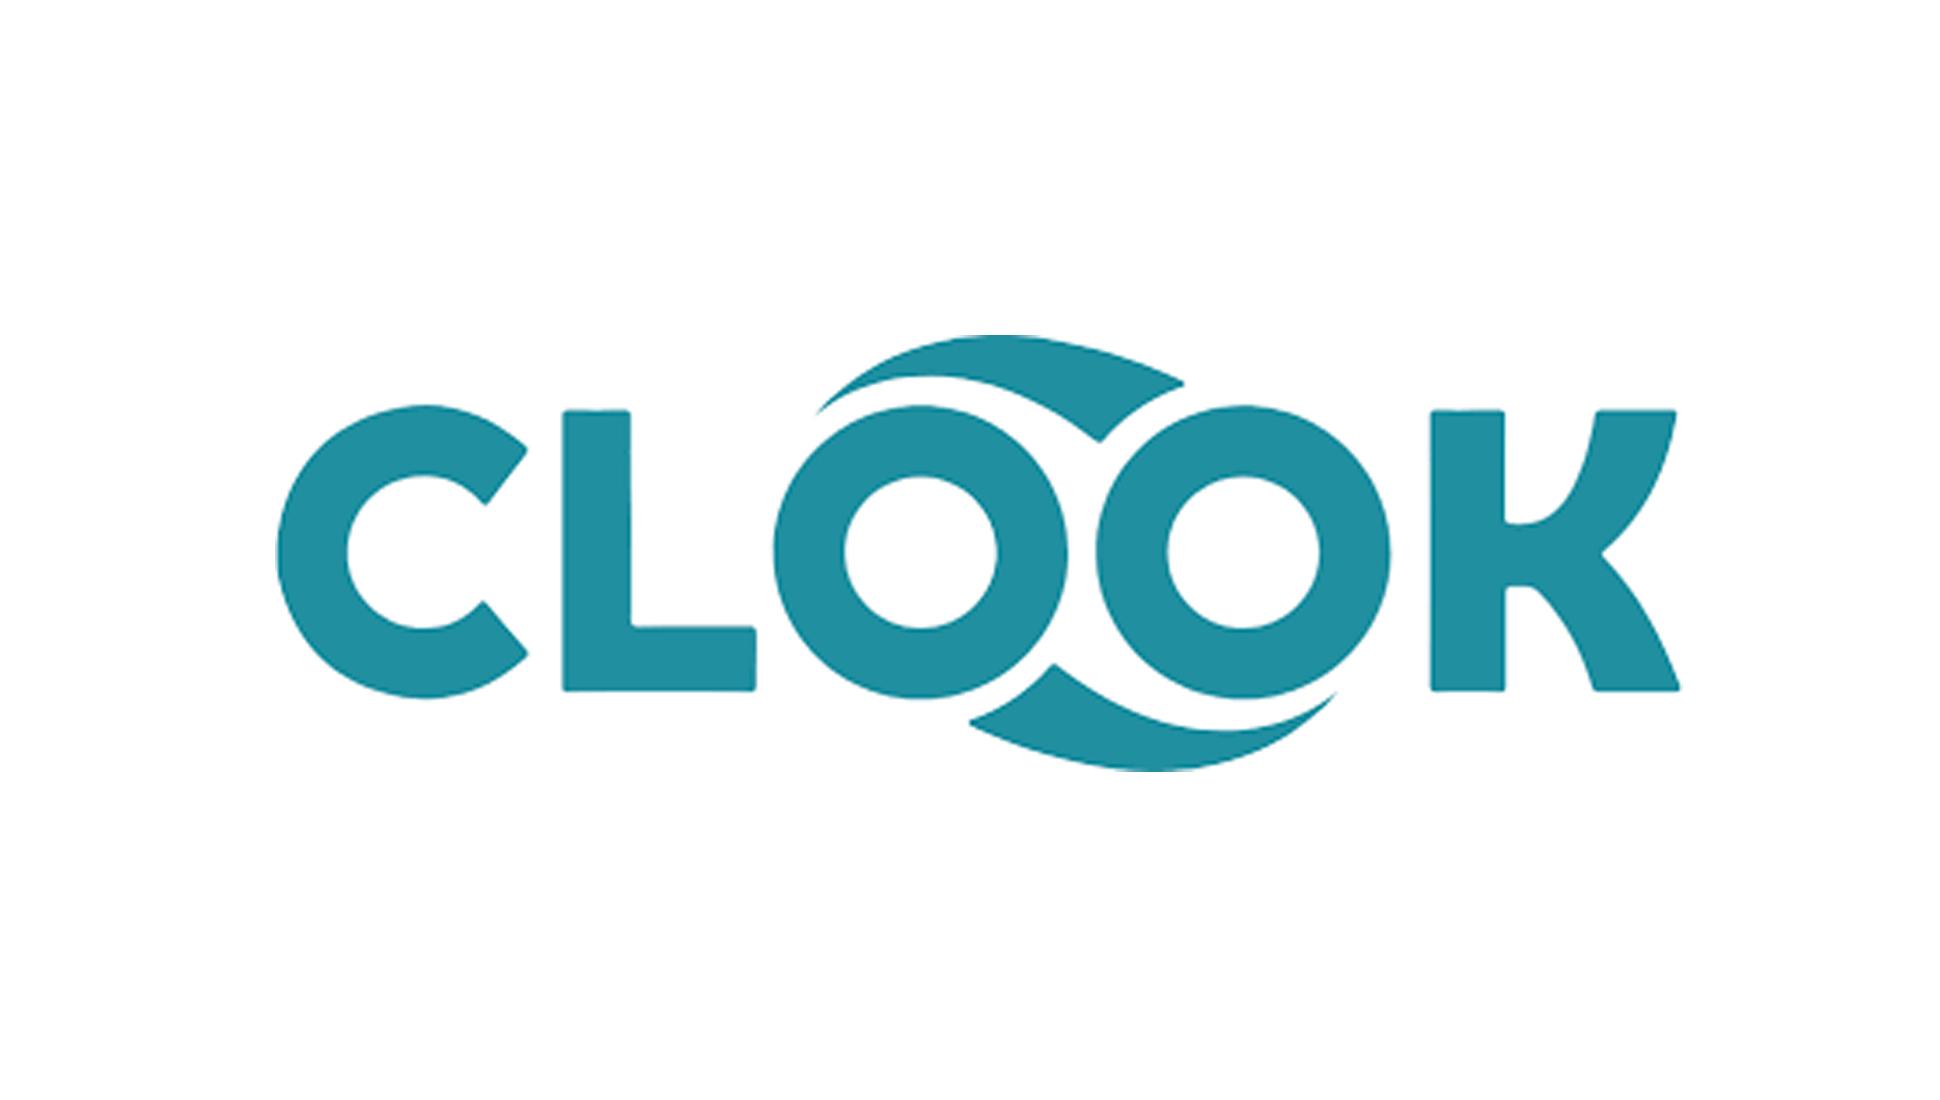 Clook logo